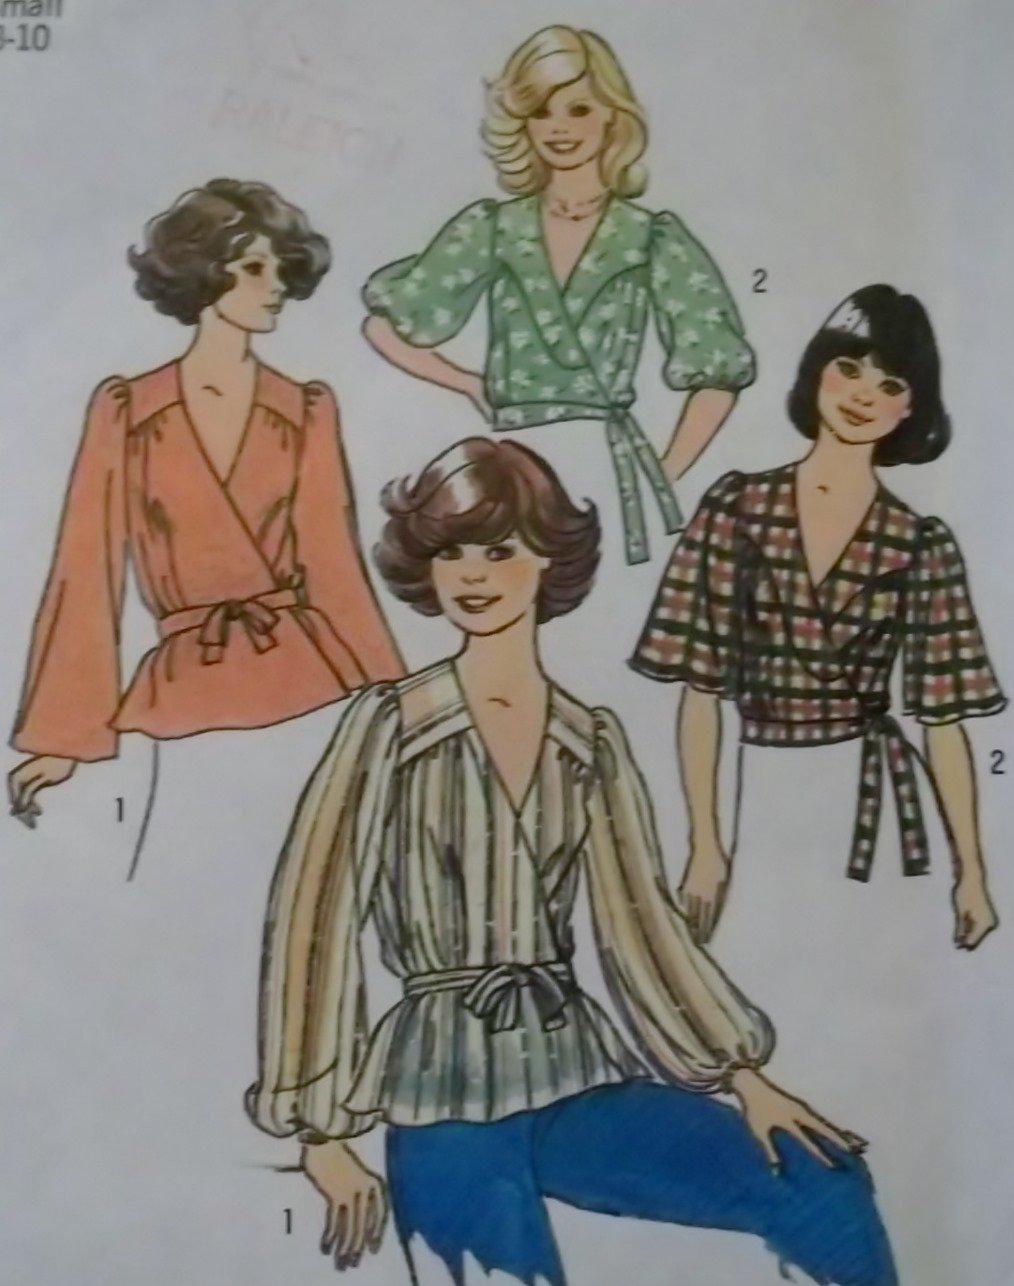 Vintage Misses' Front Wrap Tops Simplicity 7351 Sewing Pattern, Size SM 8 10, Uncut